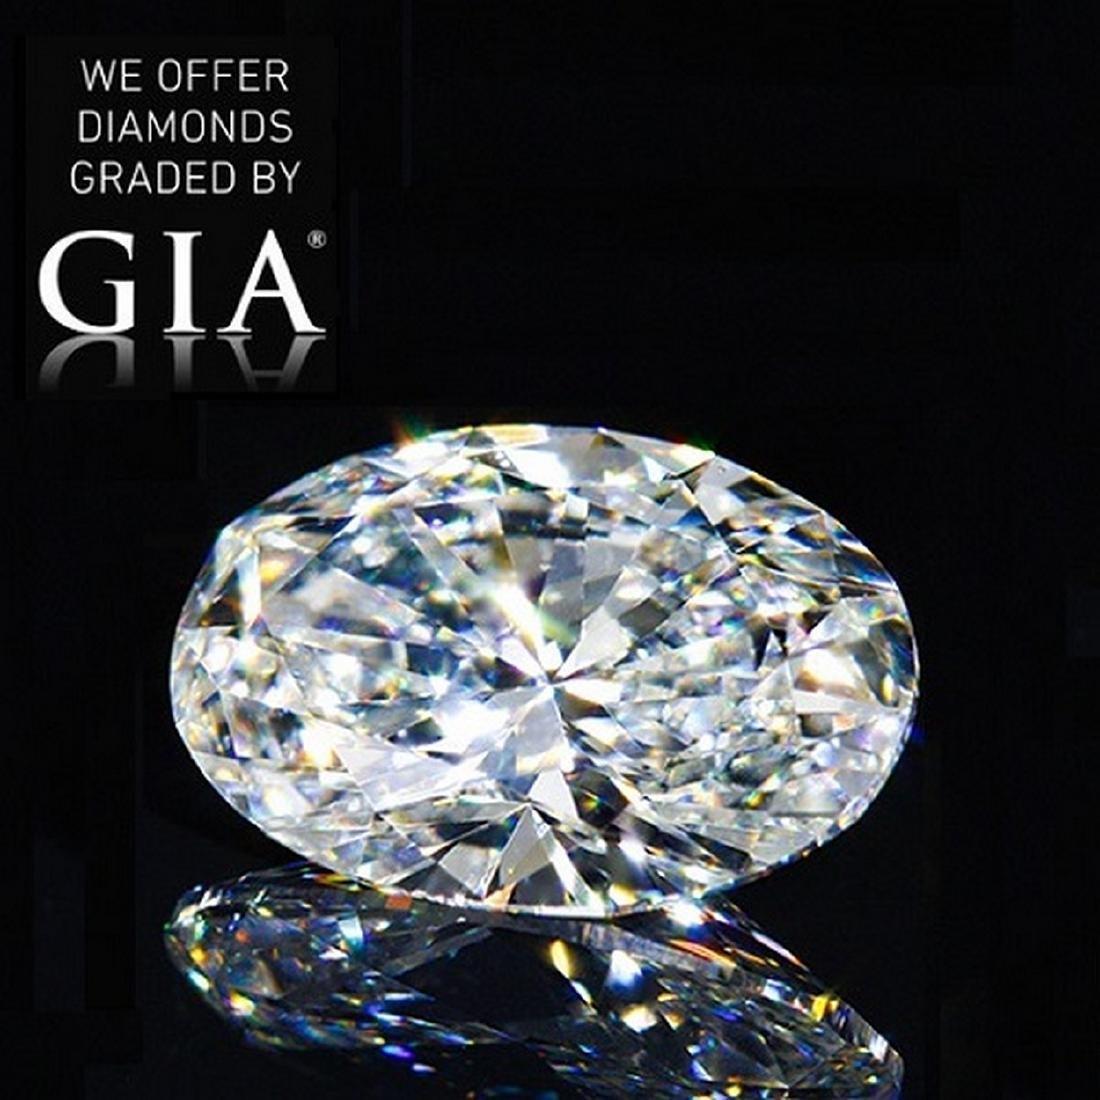 2.01 ct, Color E/VVS1, Oval cut Diamond